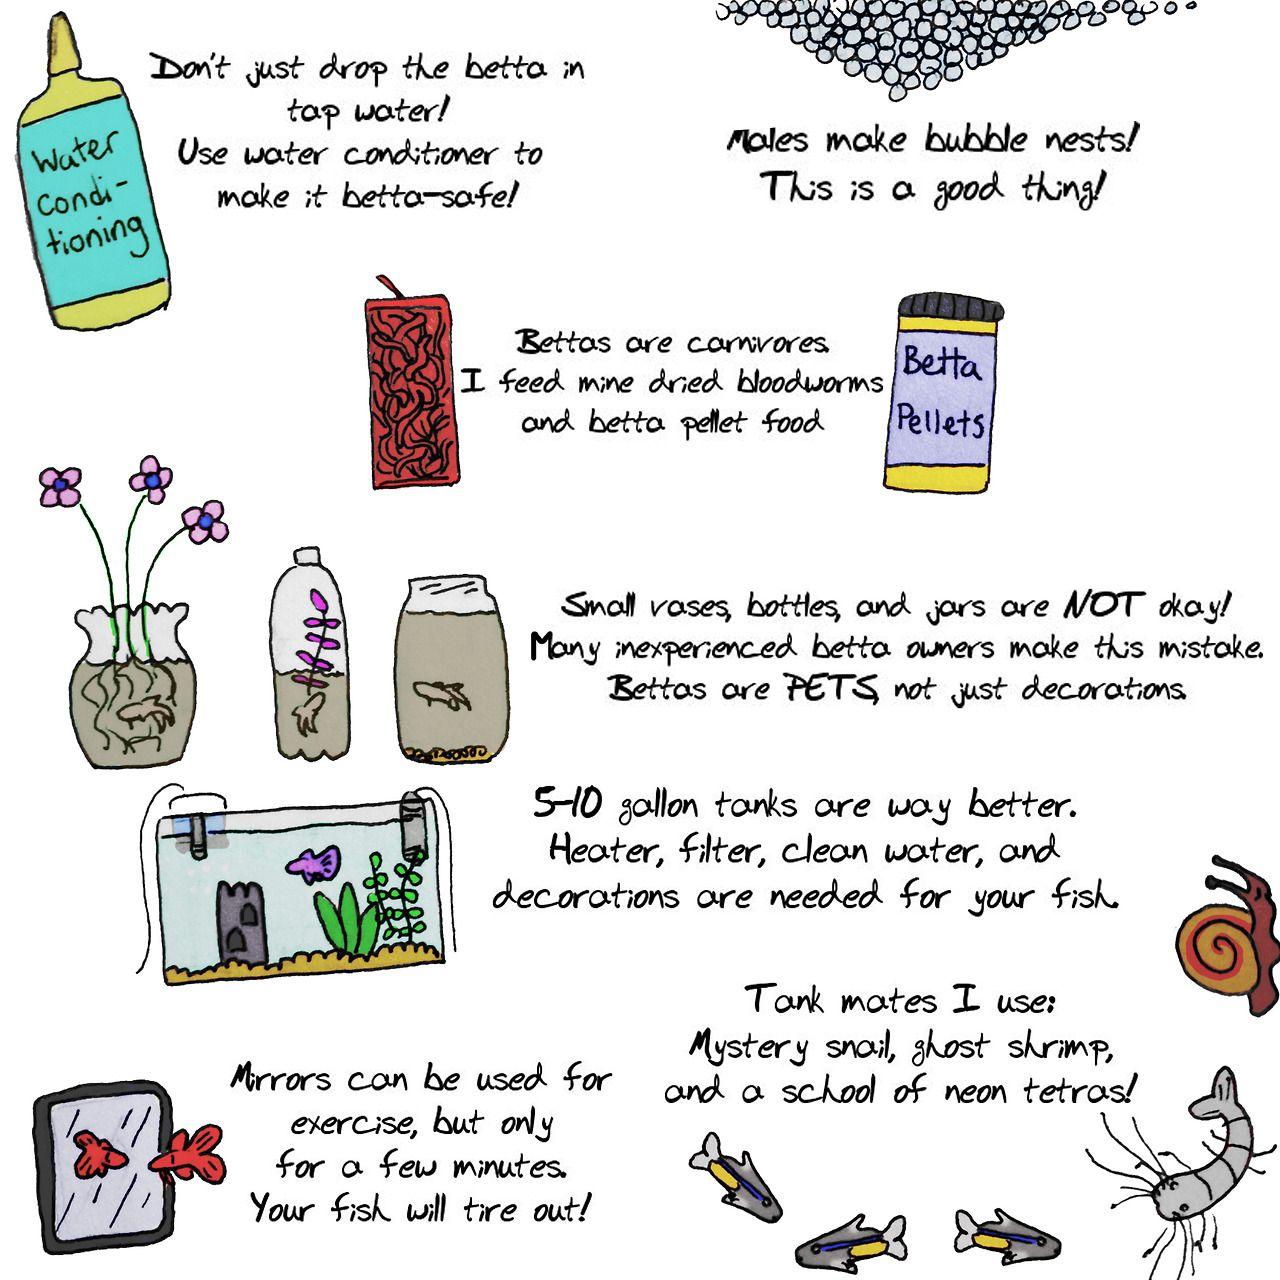 Part 2 Betta Care Tips